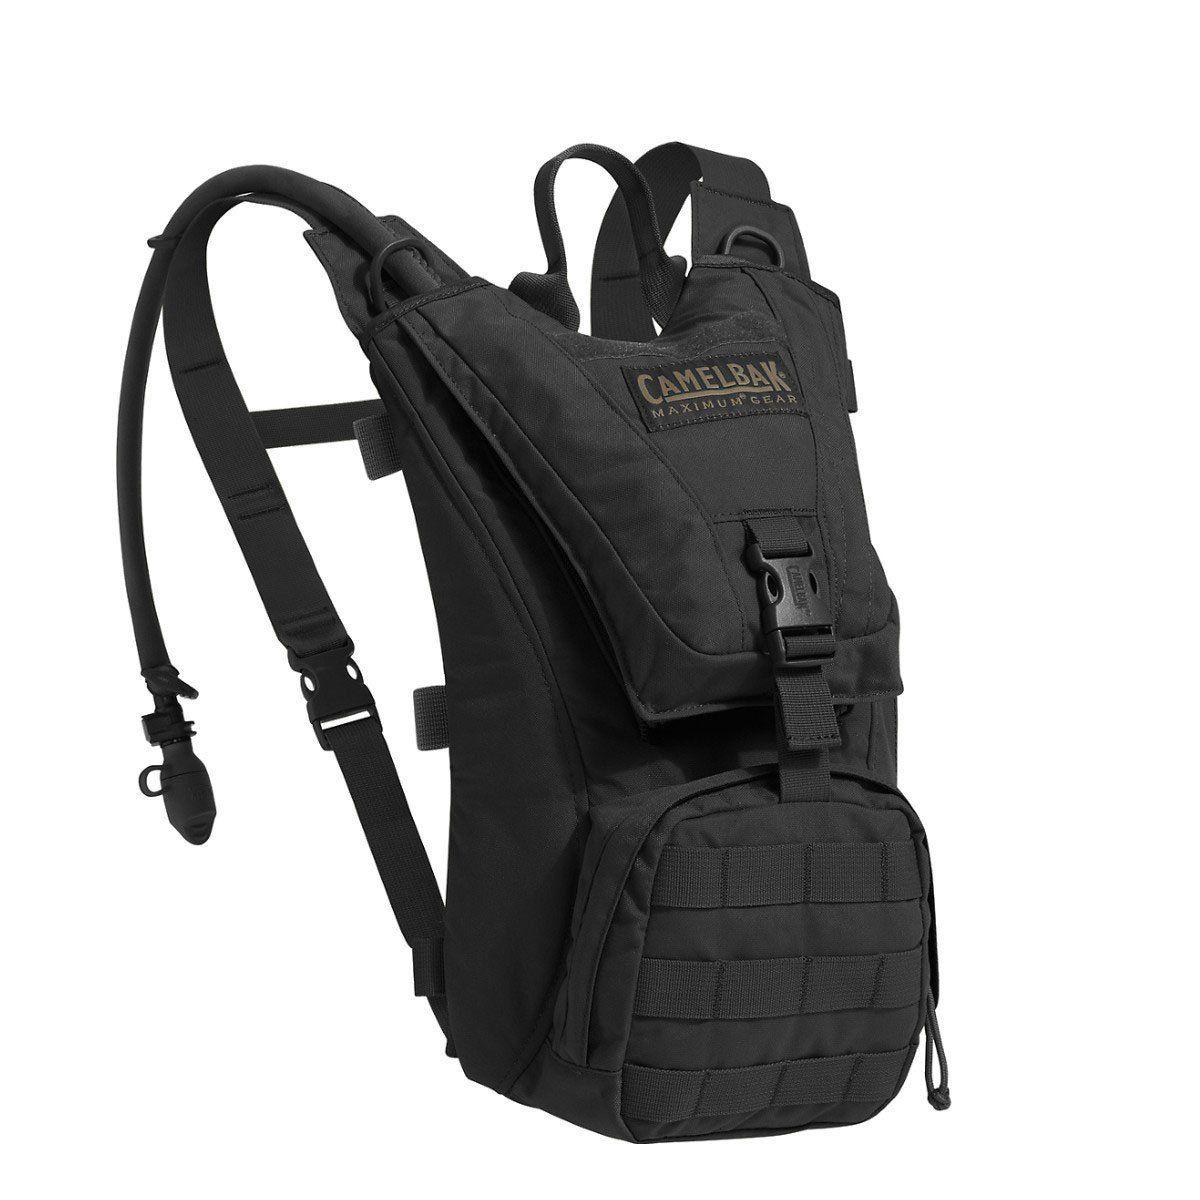 Camelbak Ambush Tactical Hydration Backpack